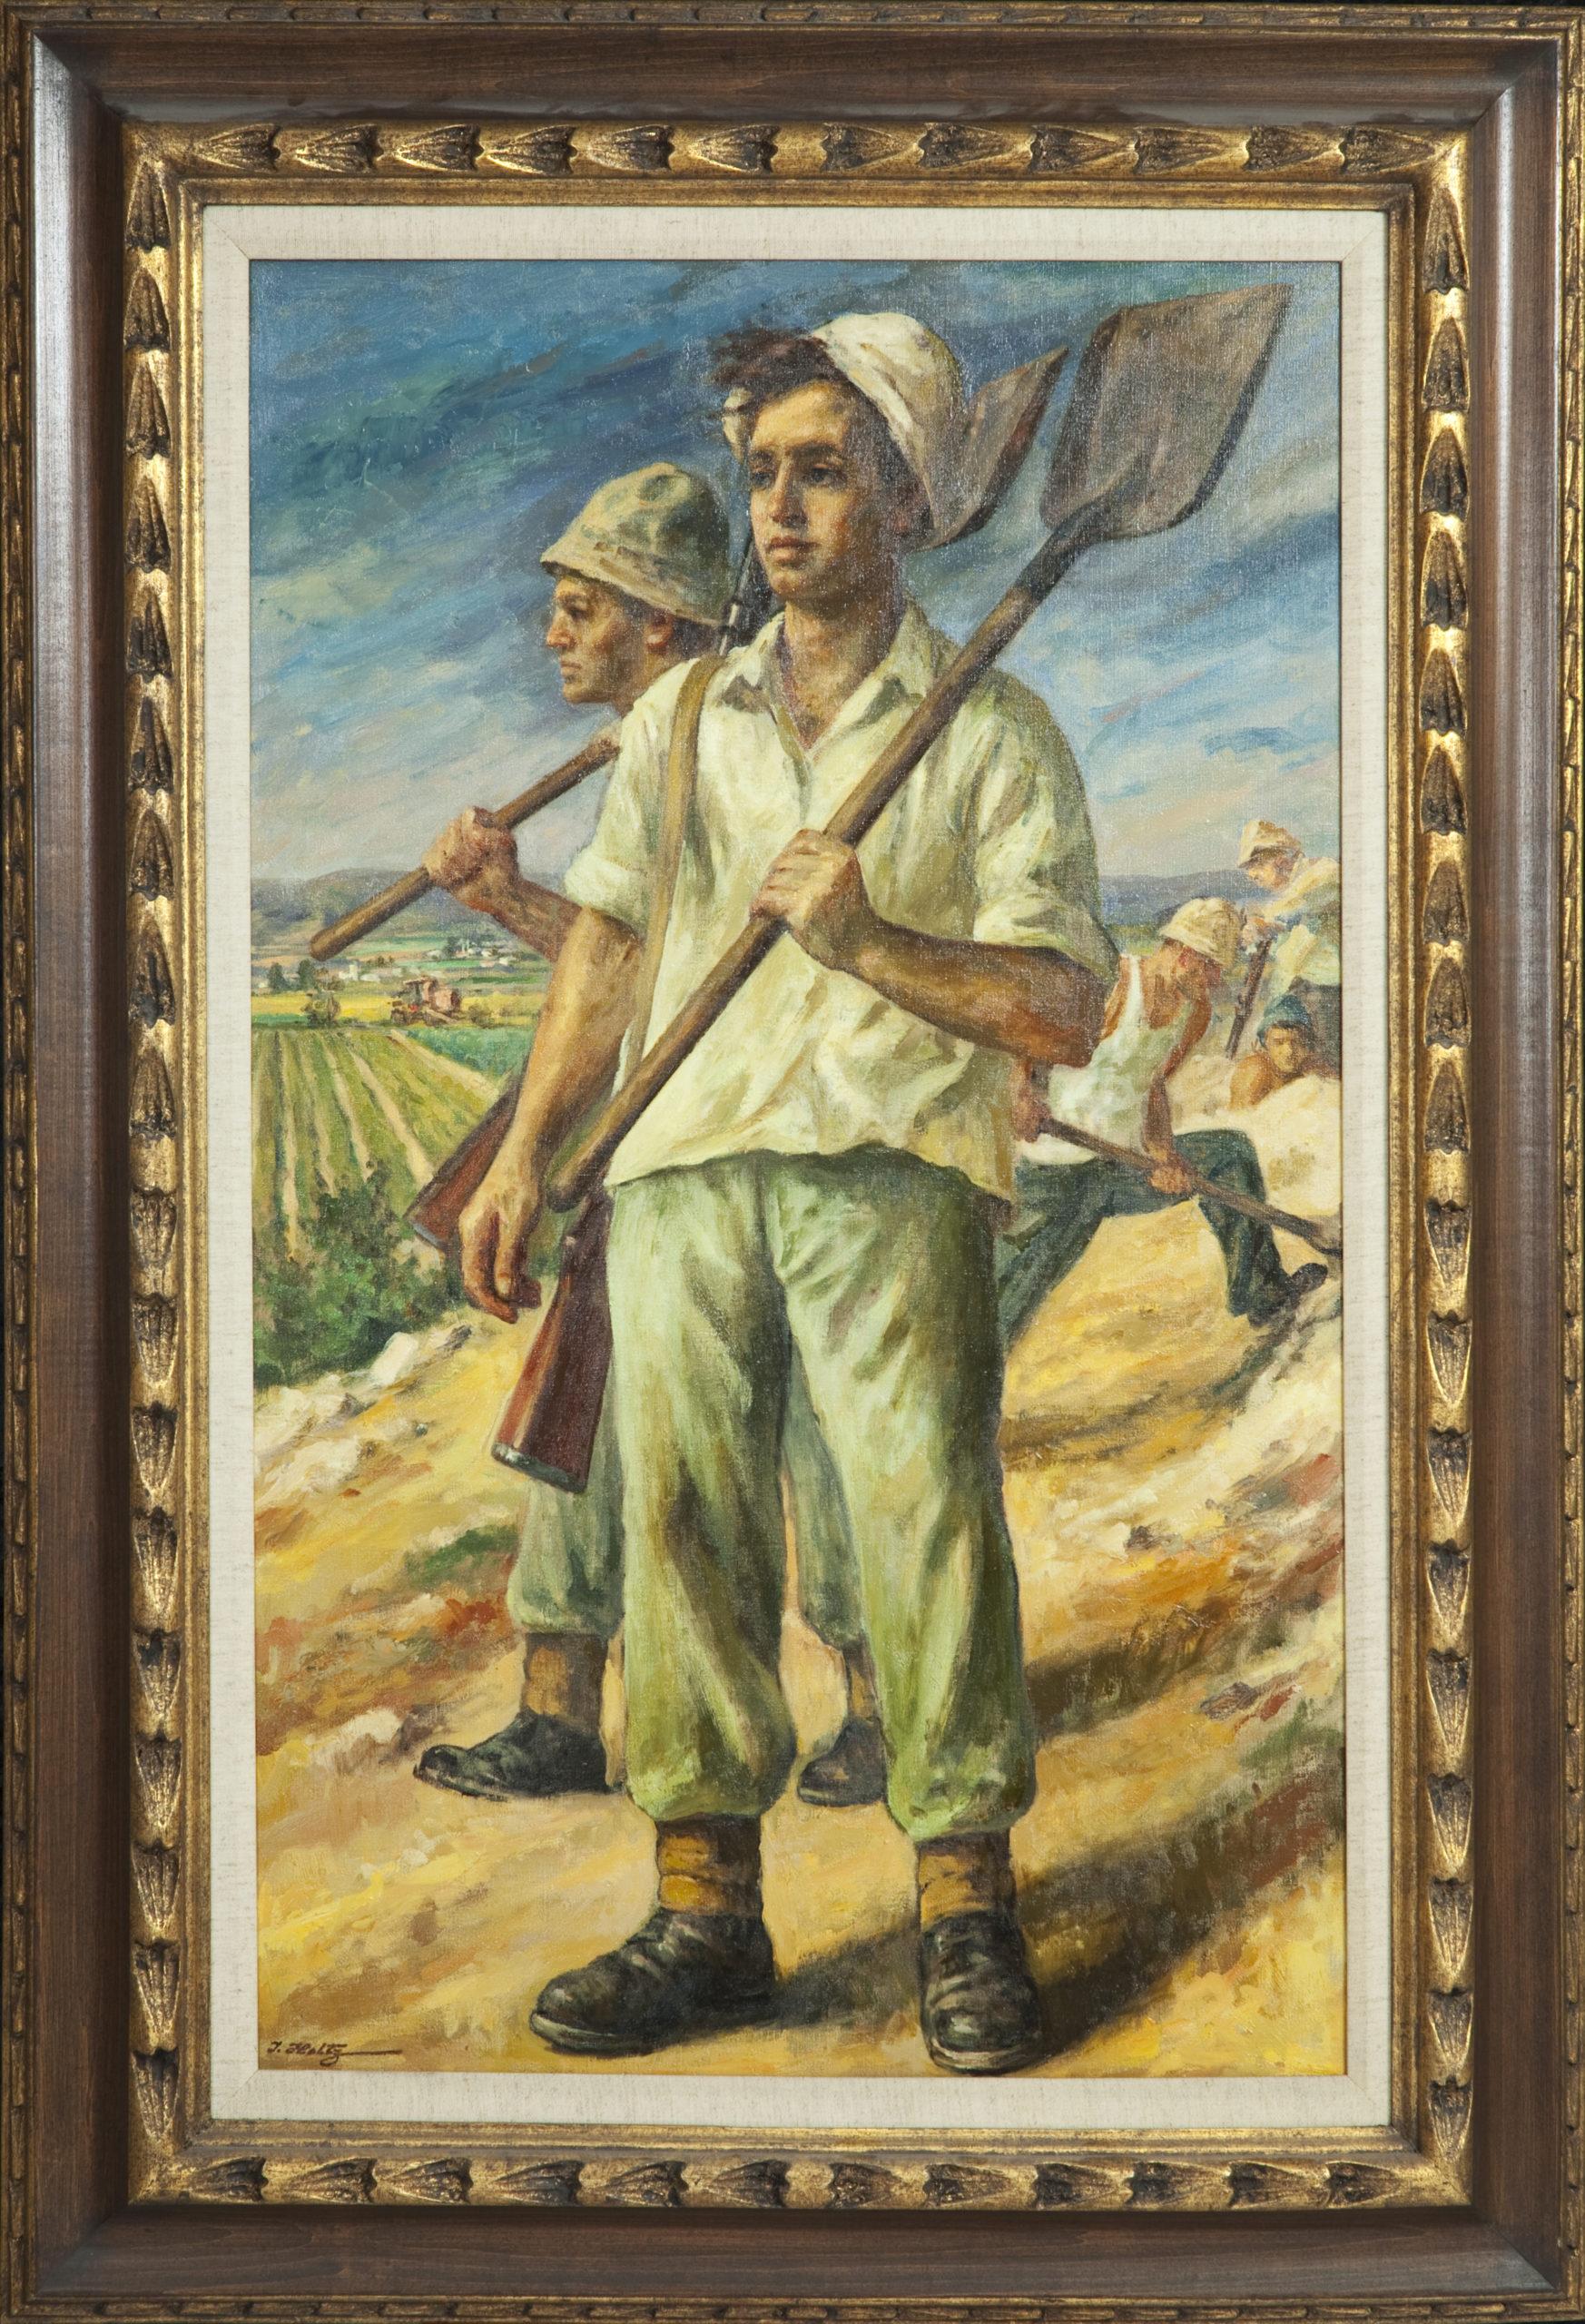 133 Israeli Spirit 1967 - Oil on Canvas - 22 x 36 - Frame: 31.5 x 45.5 x 2.5